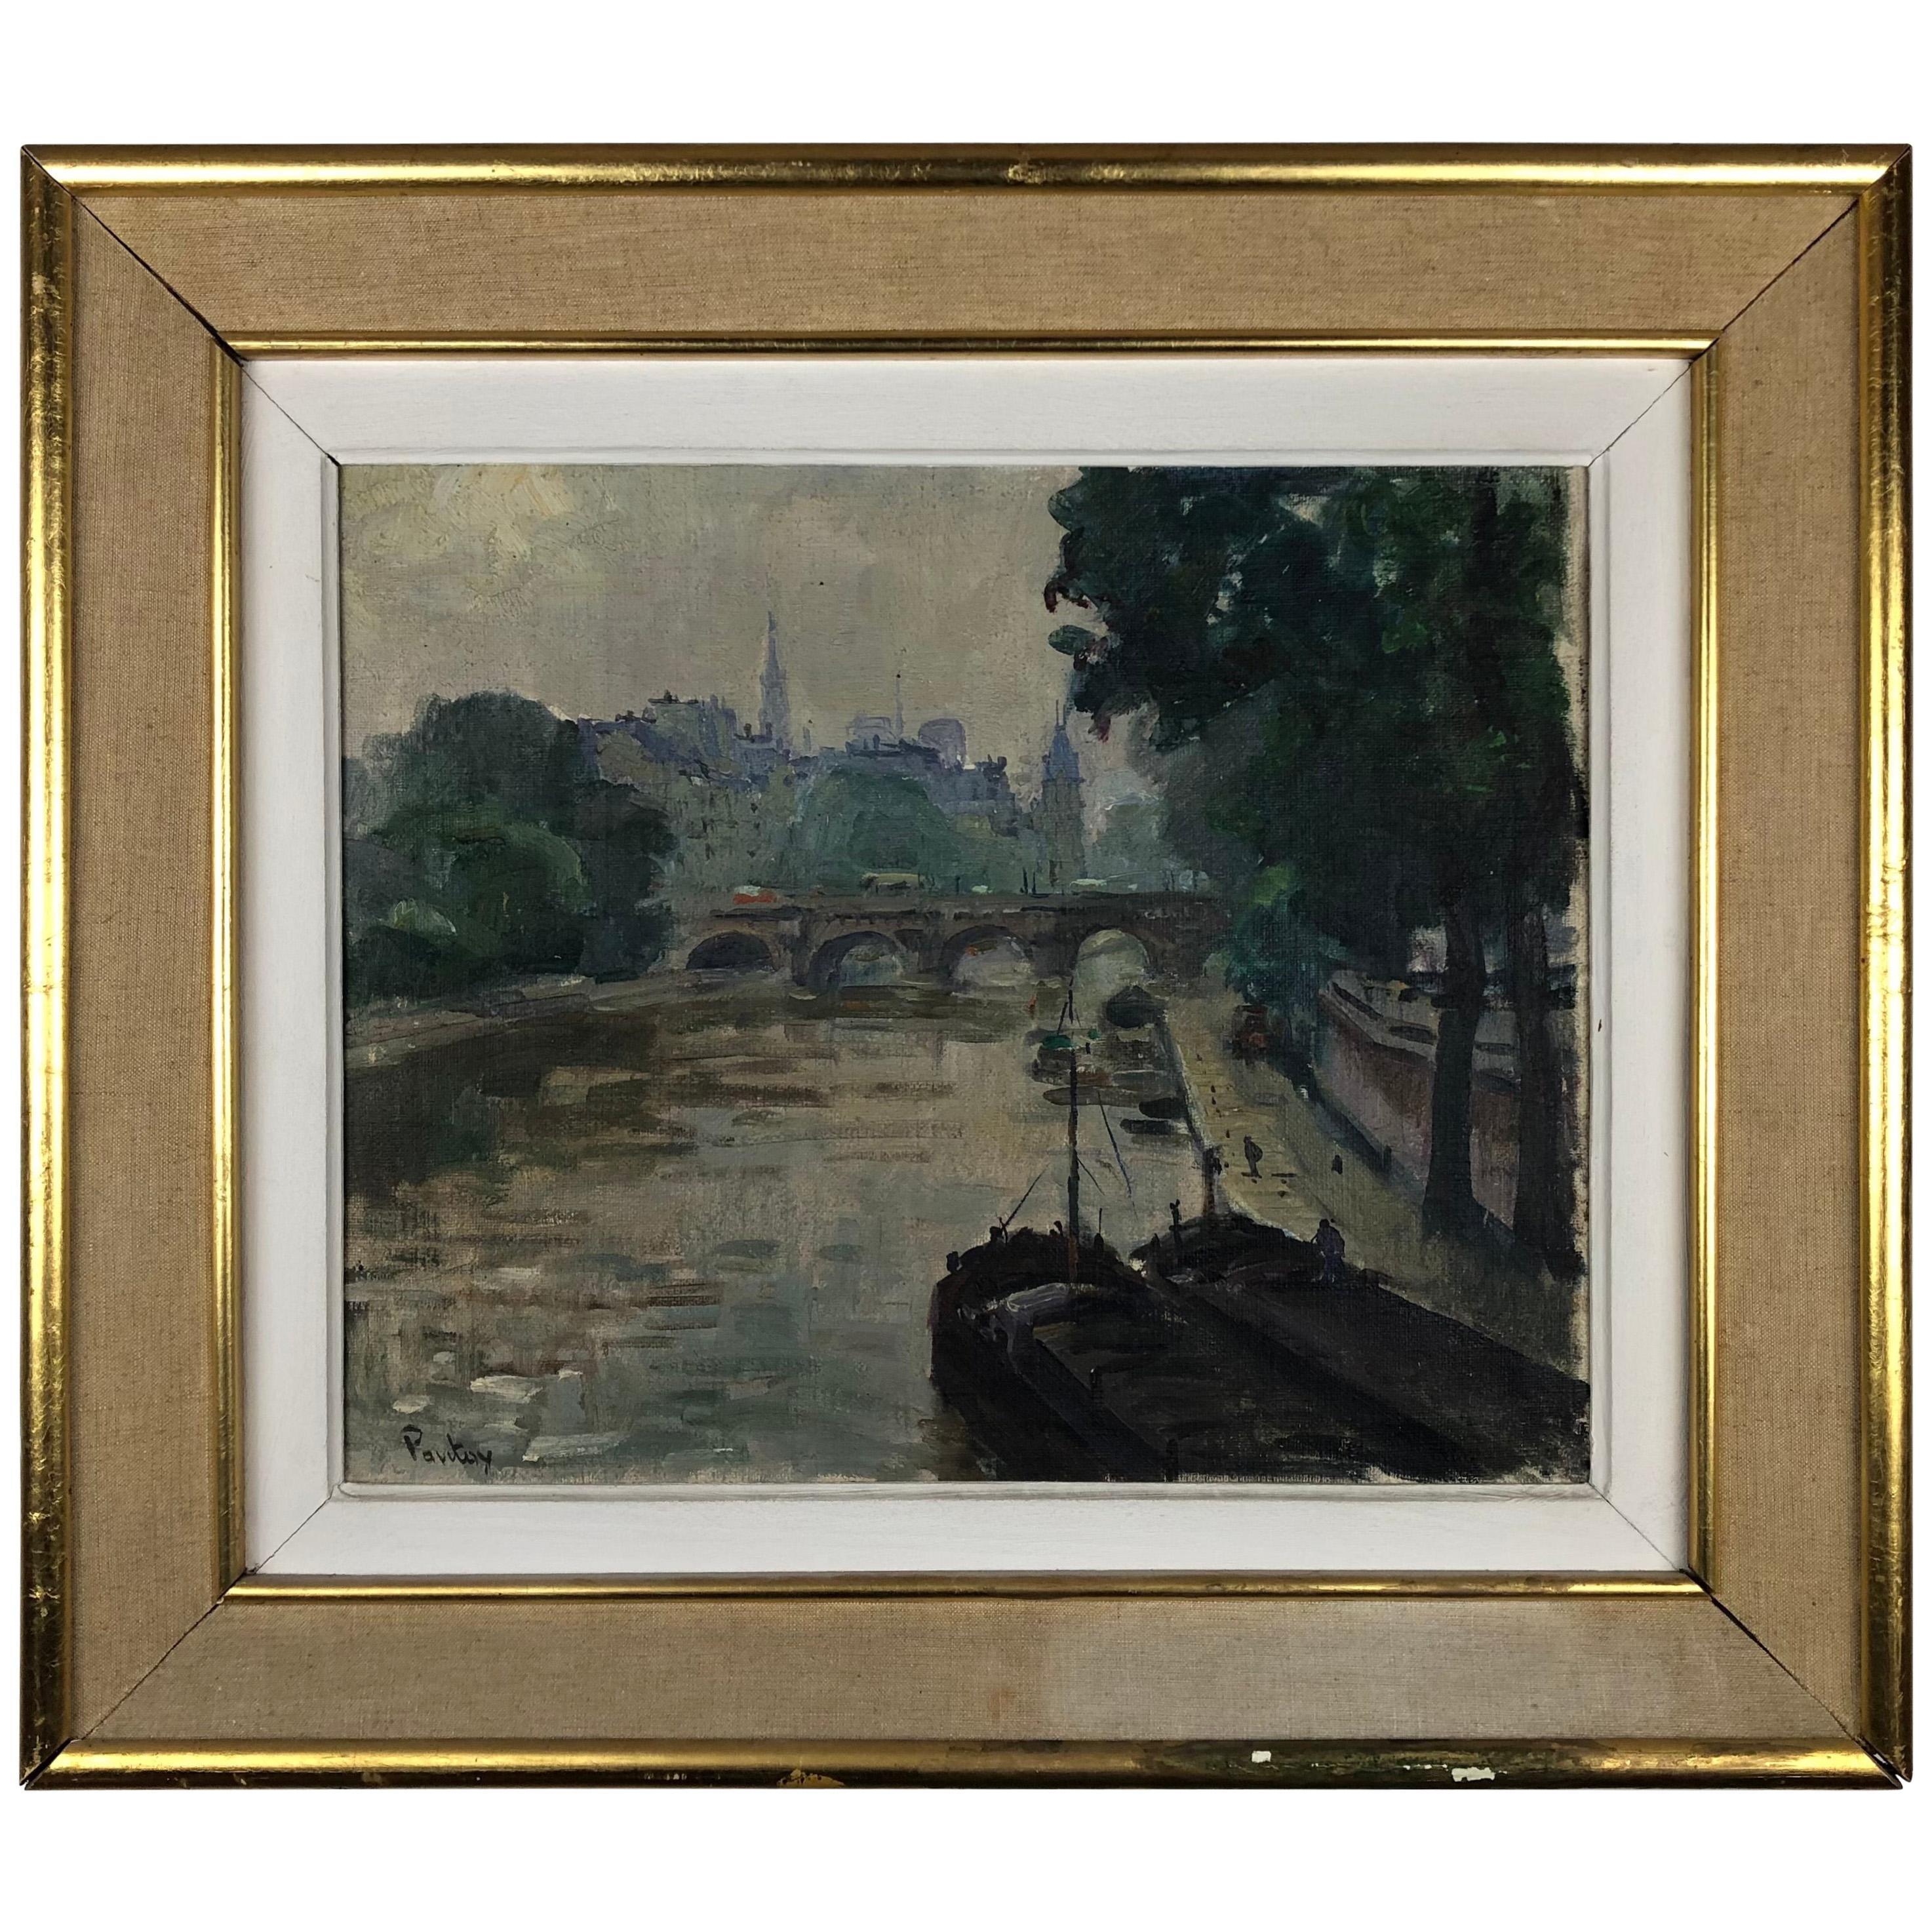 Collectible Henri Pontoy Rare Original Oil on Canvas Painting Scene Paris France